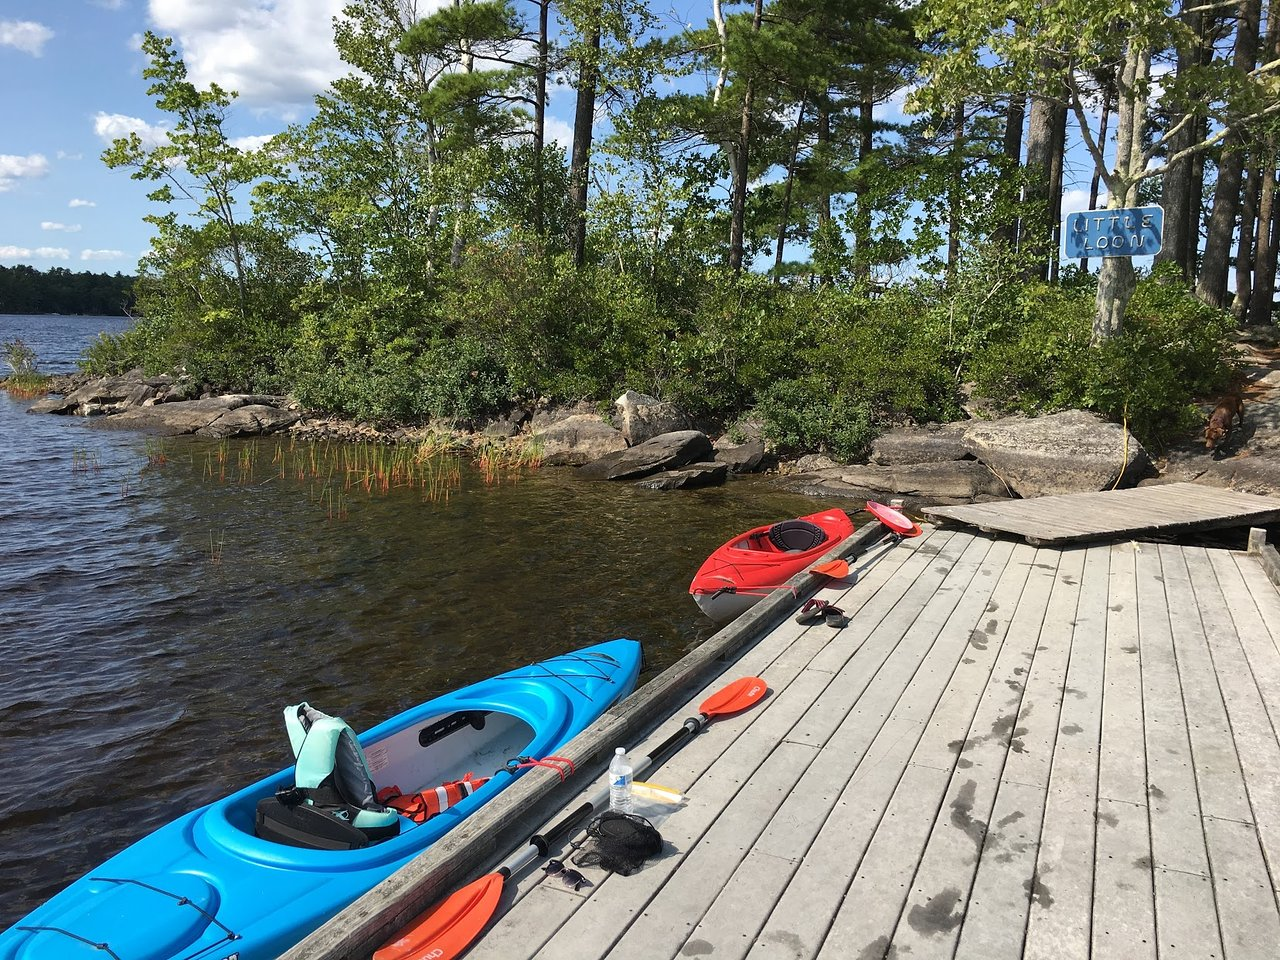 LAKE PEMAQUID CAMPGROUND - Updated 2019 Reviews (Damariscotta, Maine